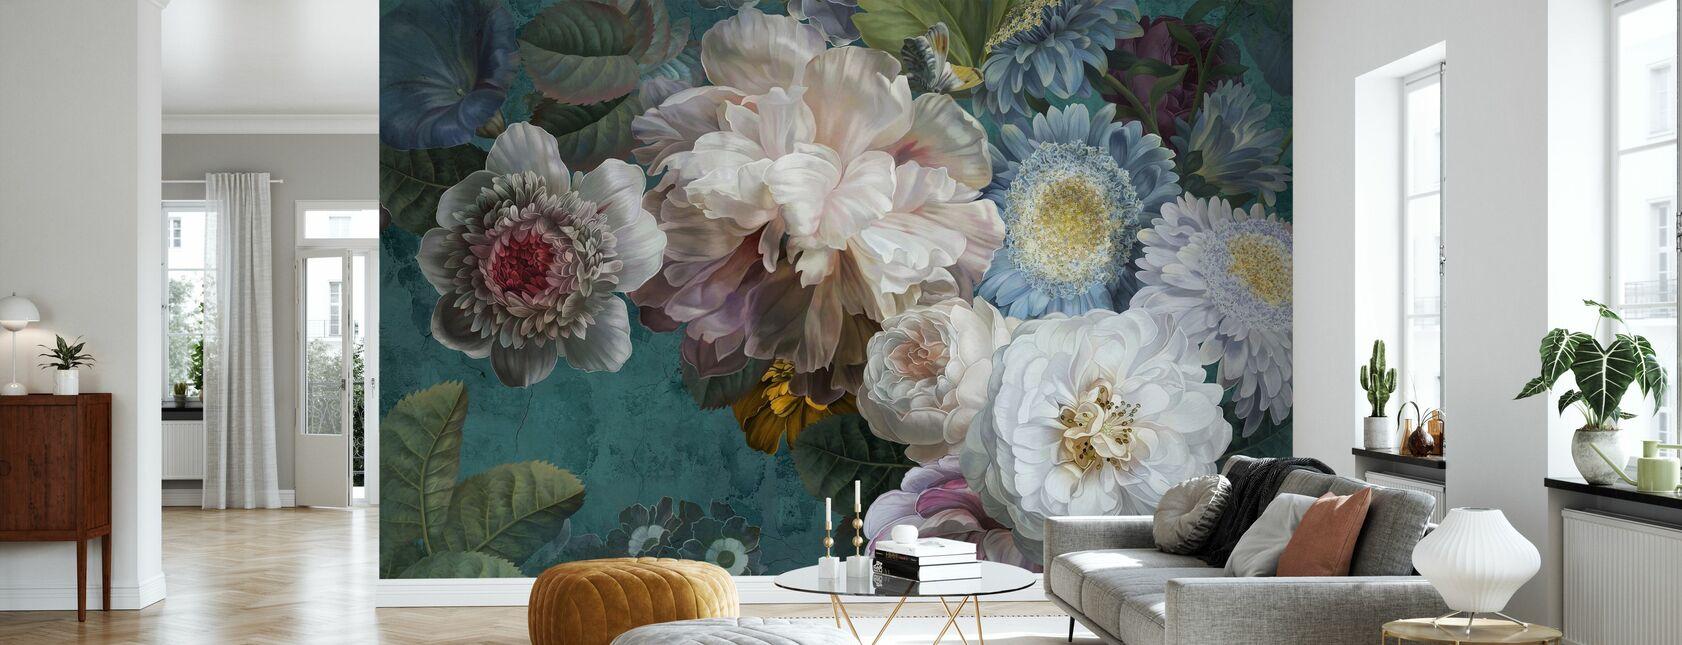 Lustre Arrangement - Emerald - Wallpaper - Living Room